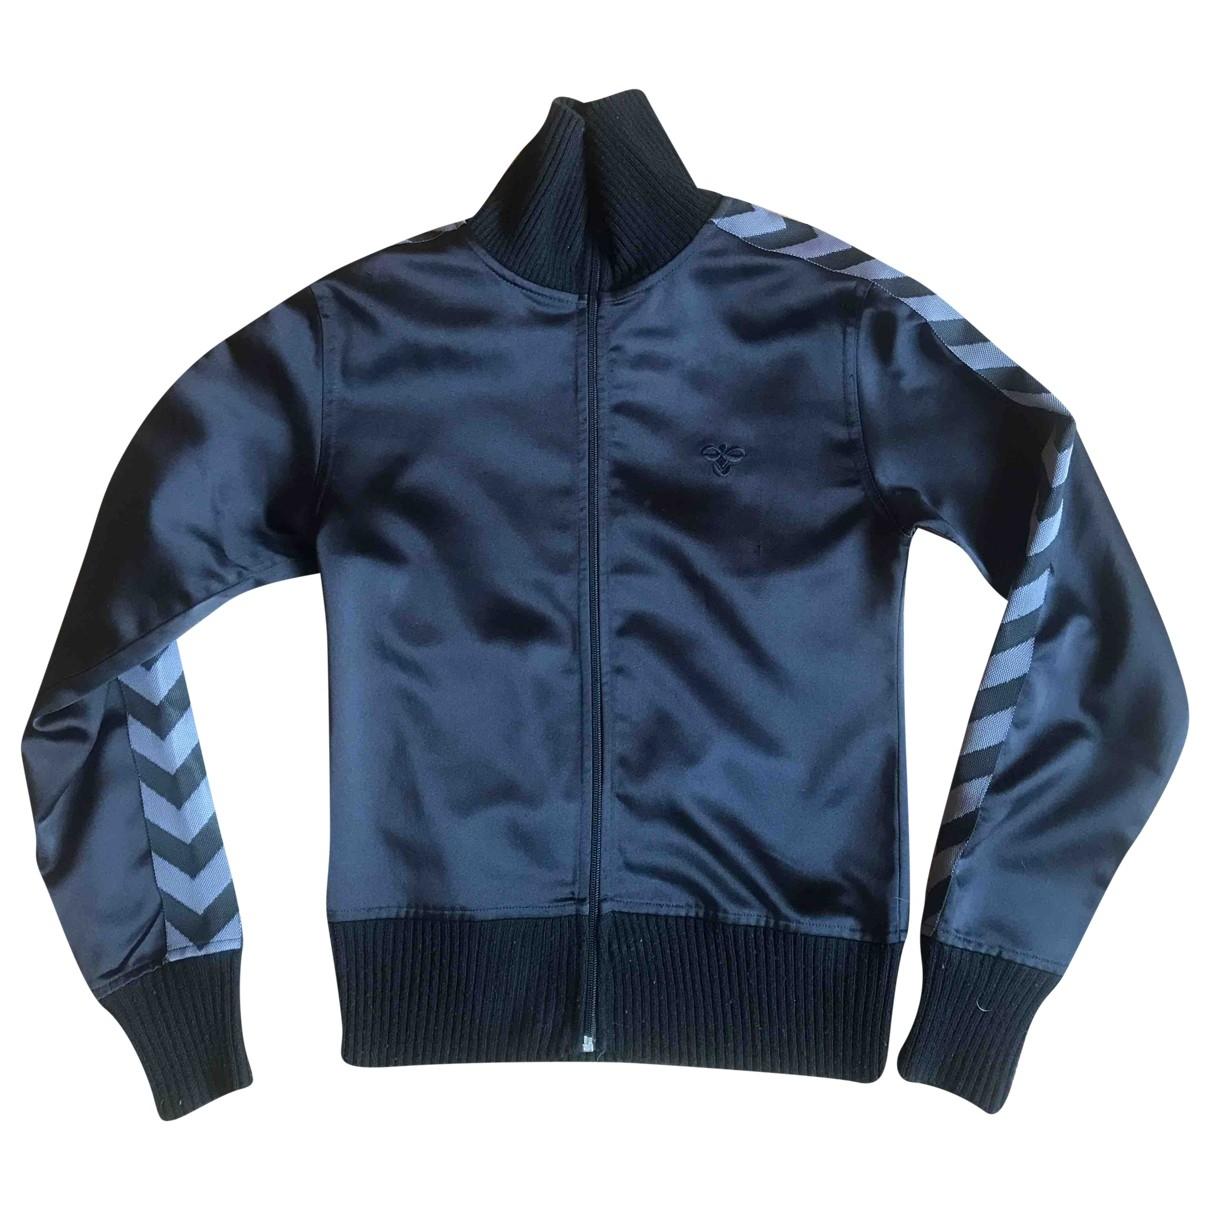 Hummel \N Black jacket for Women XS International